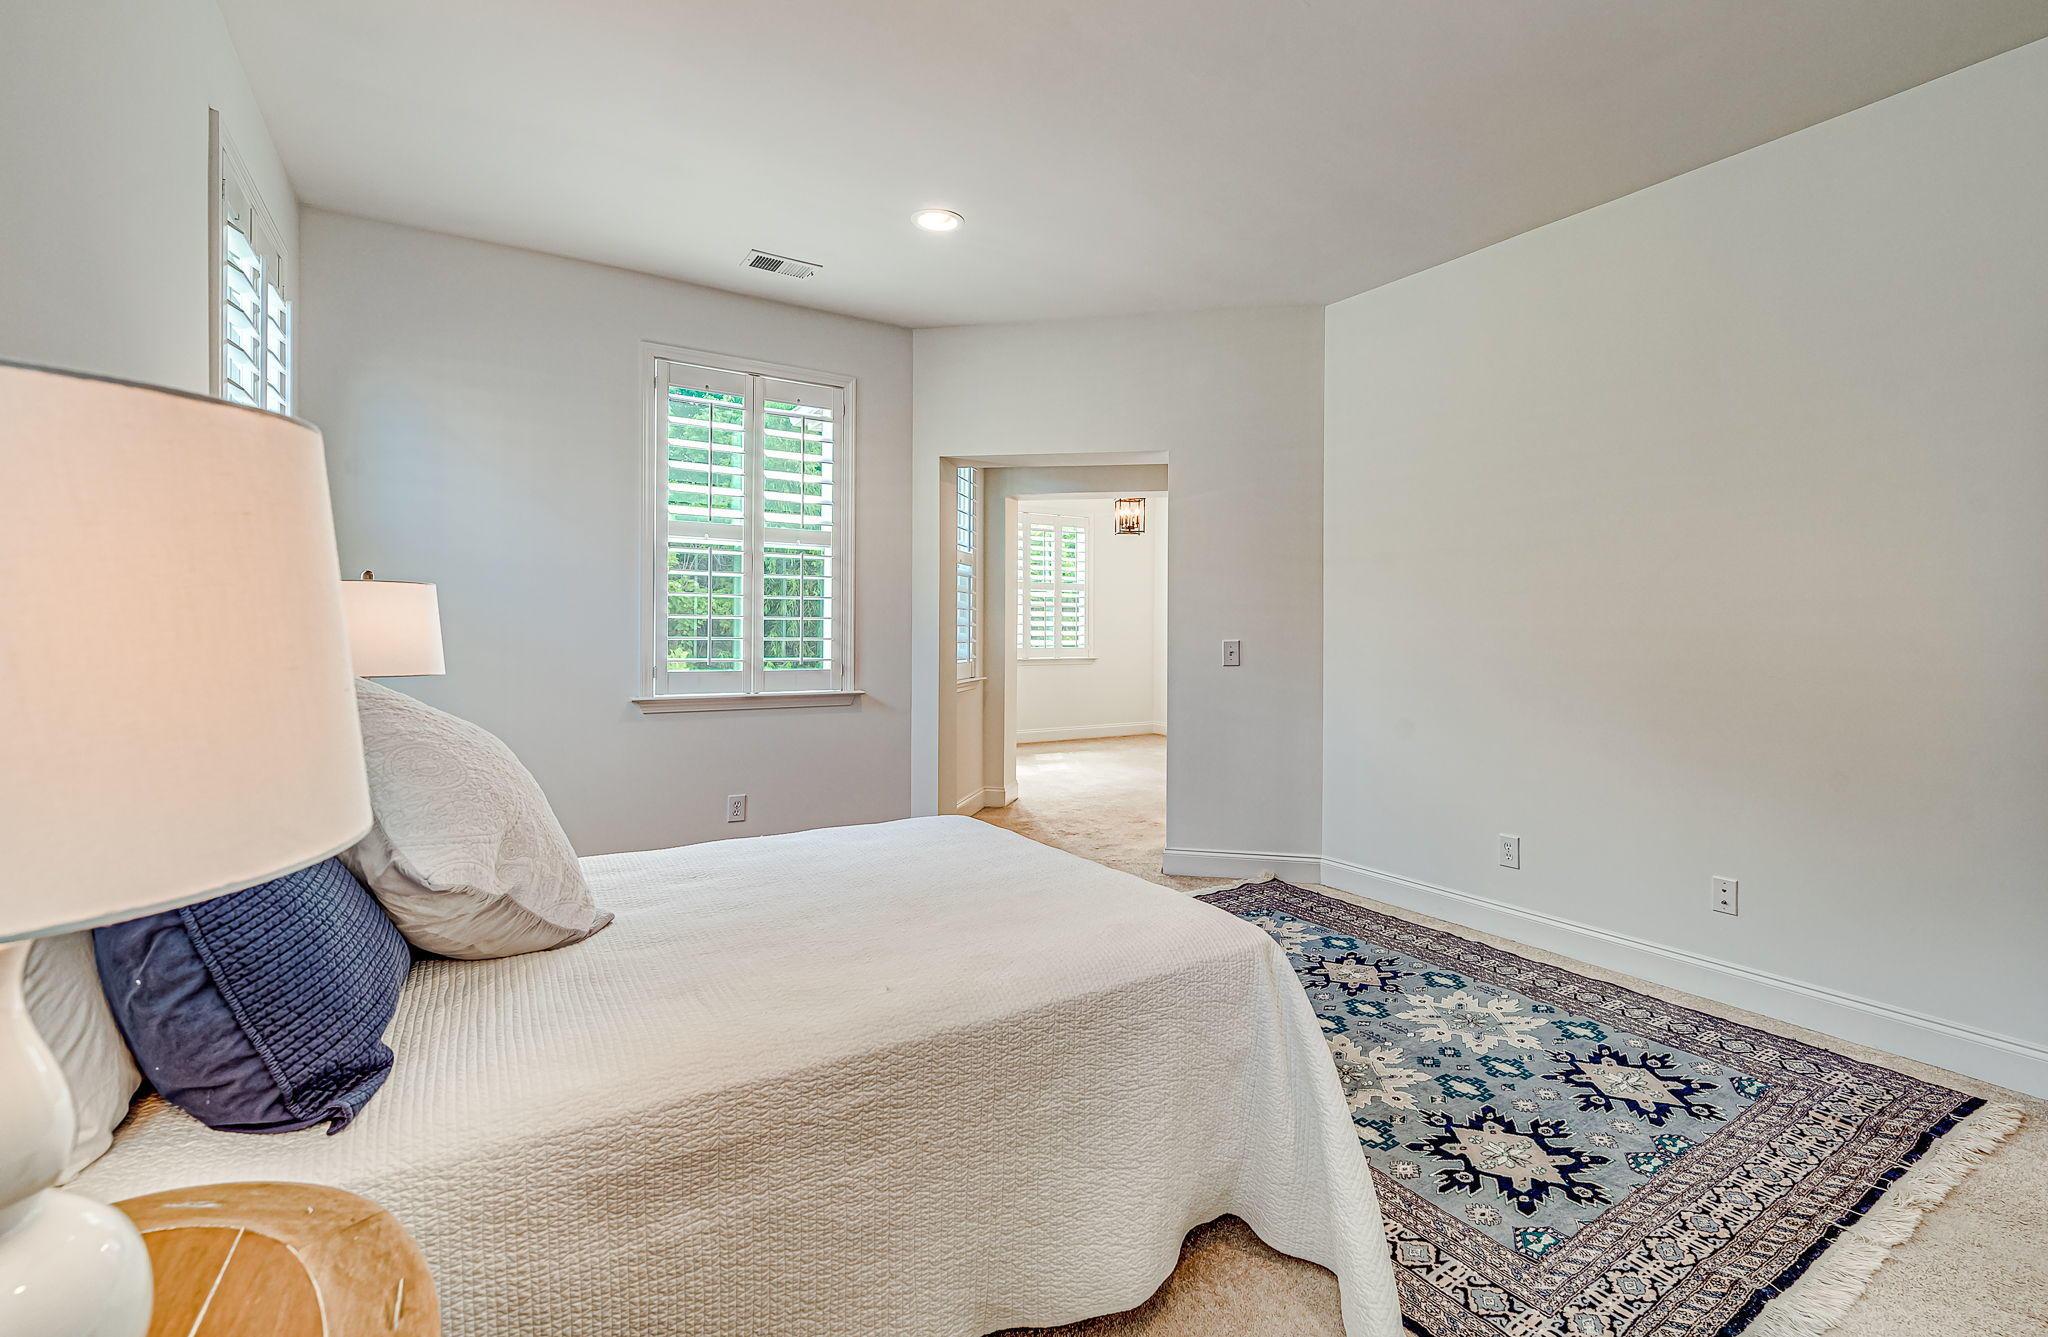 Dunes West Homes For Sale - 2476 Kings Gate, Mount Pleasant, SC - 19